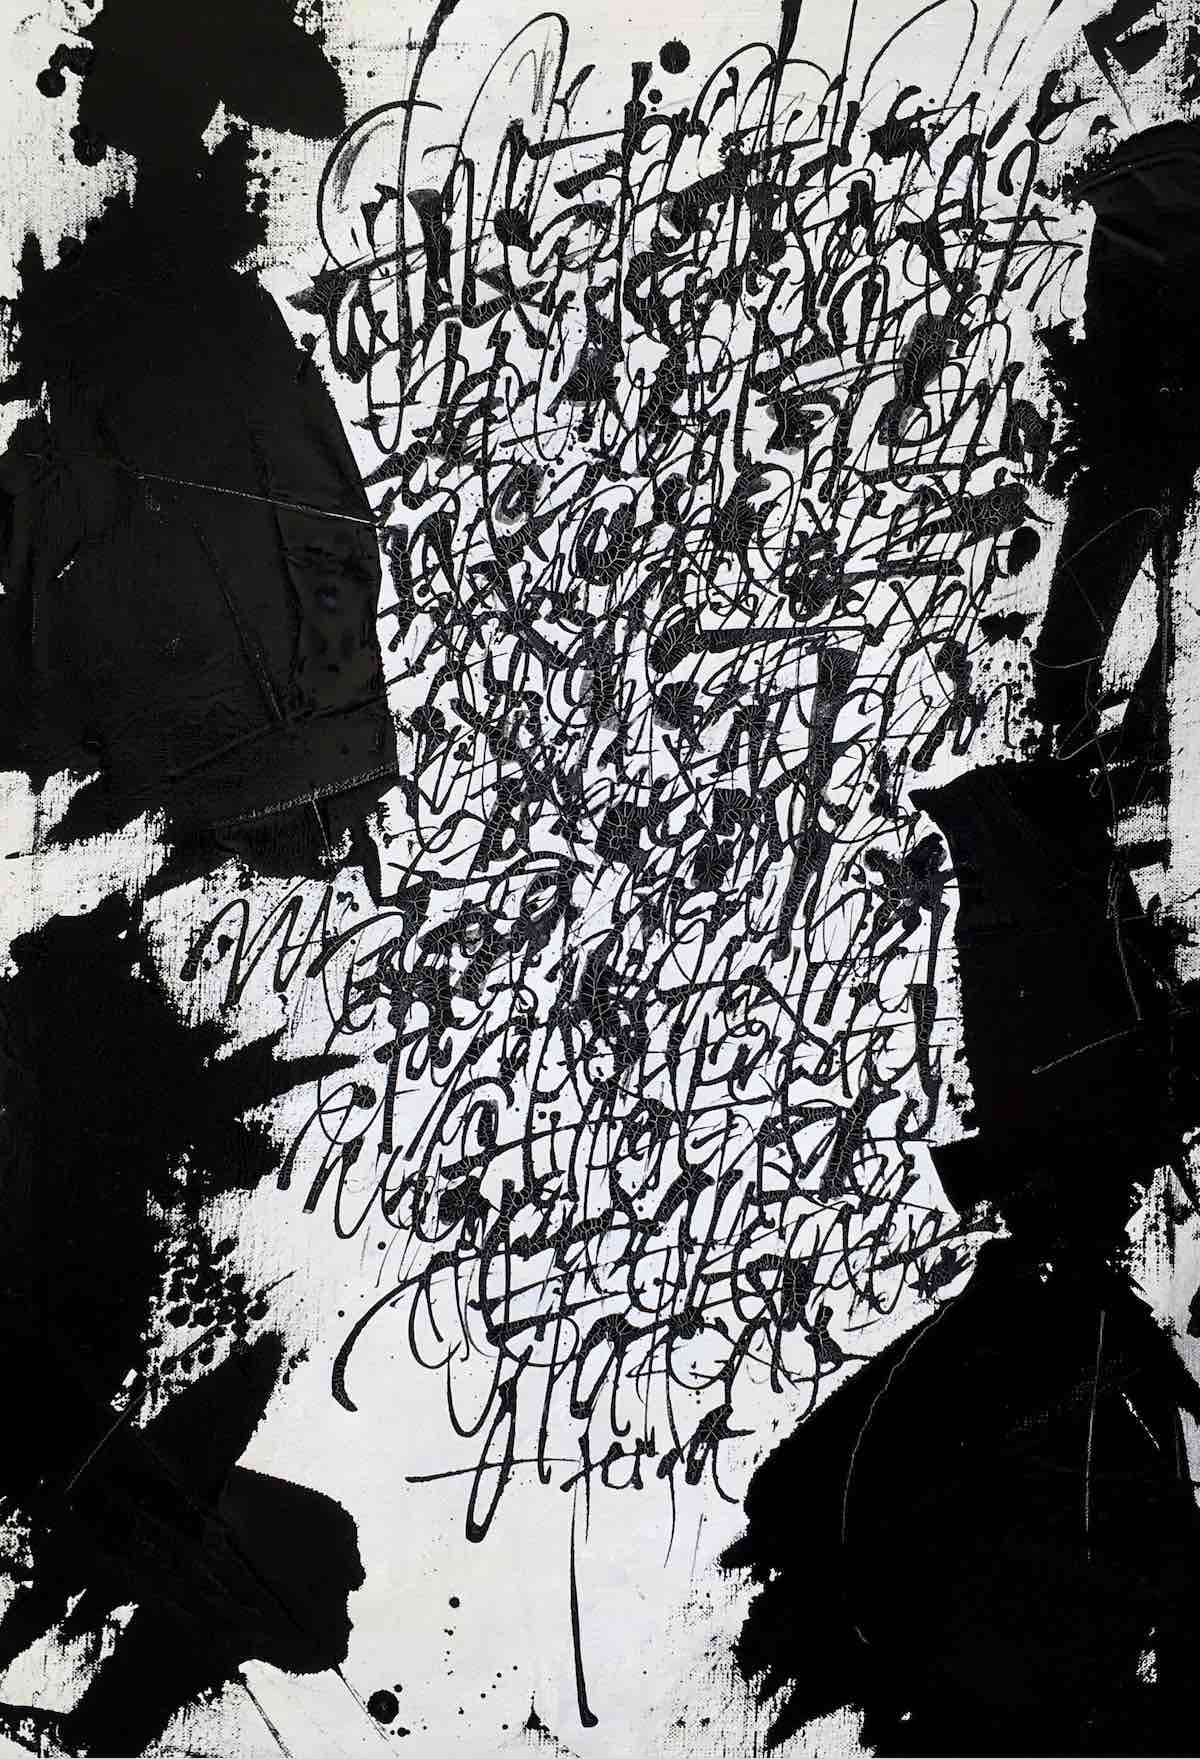 Travaux sur Toiles - Christophe Badani - Abstractions